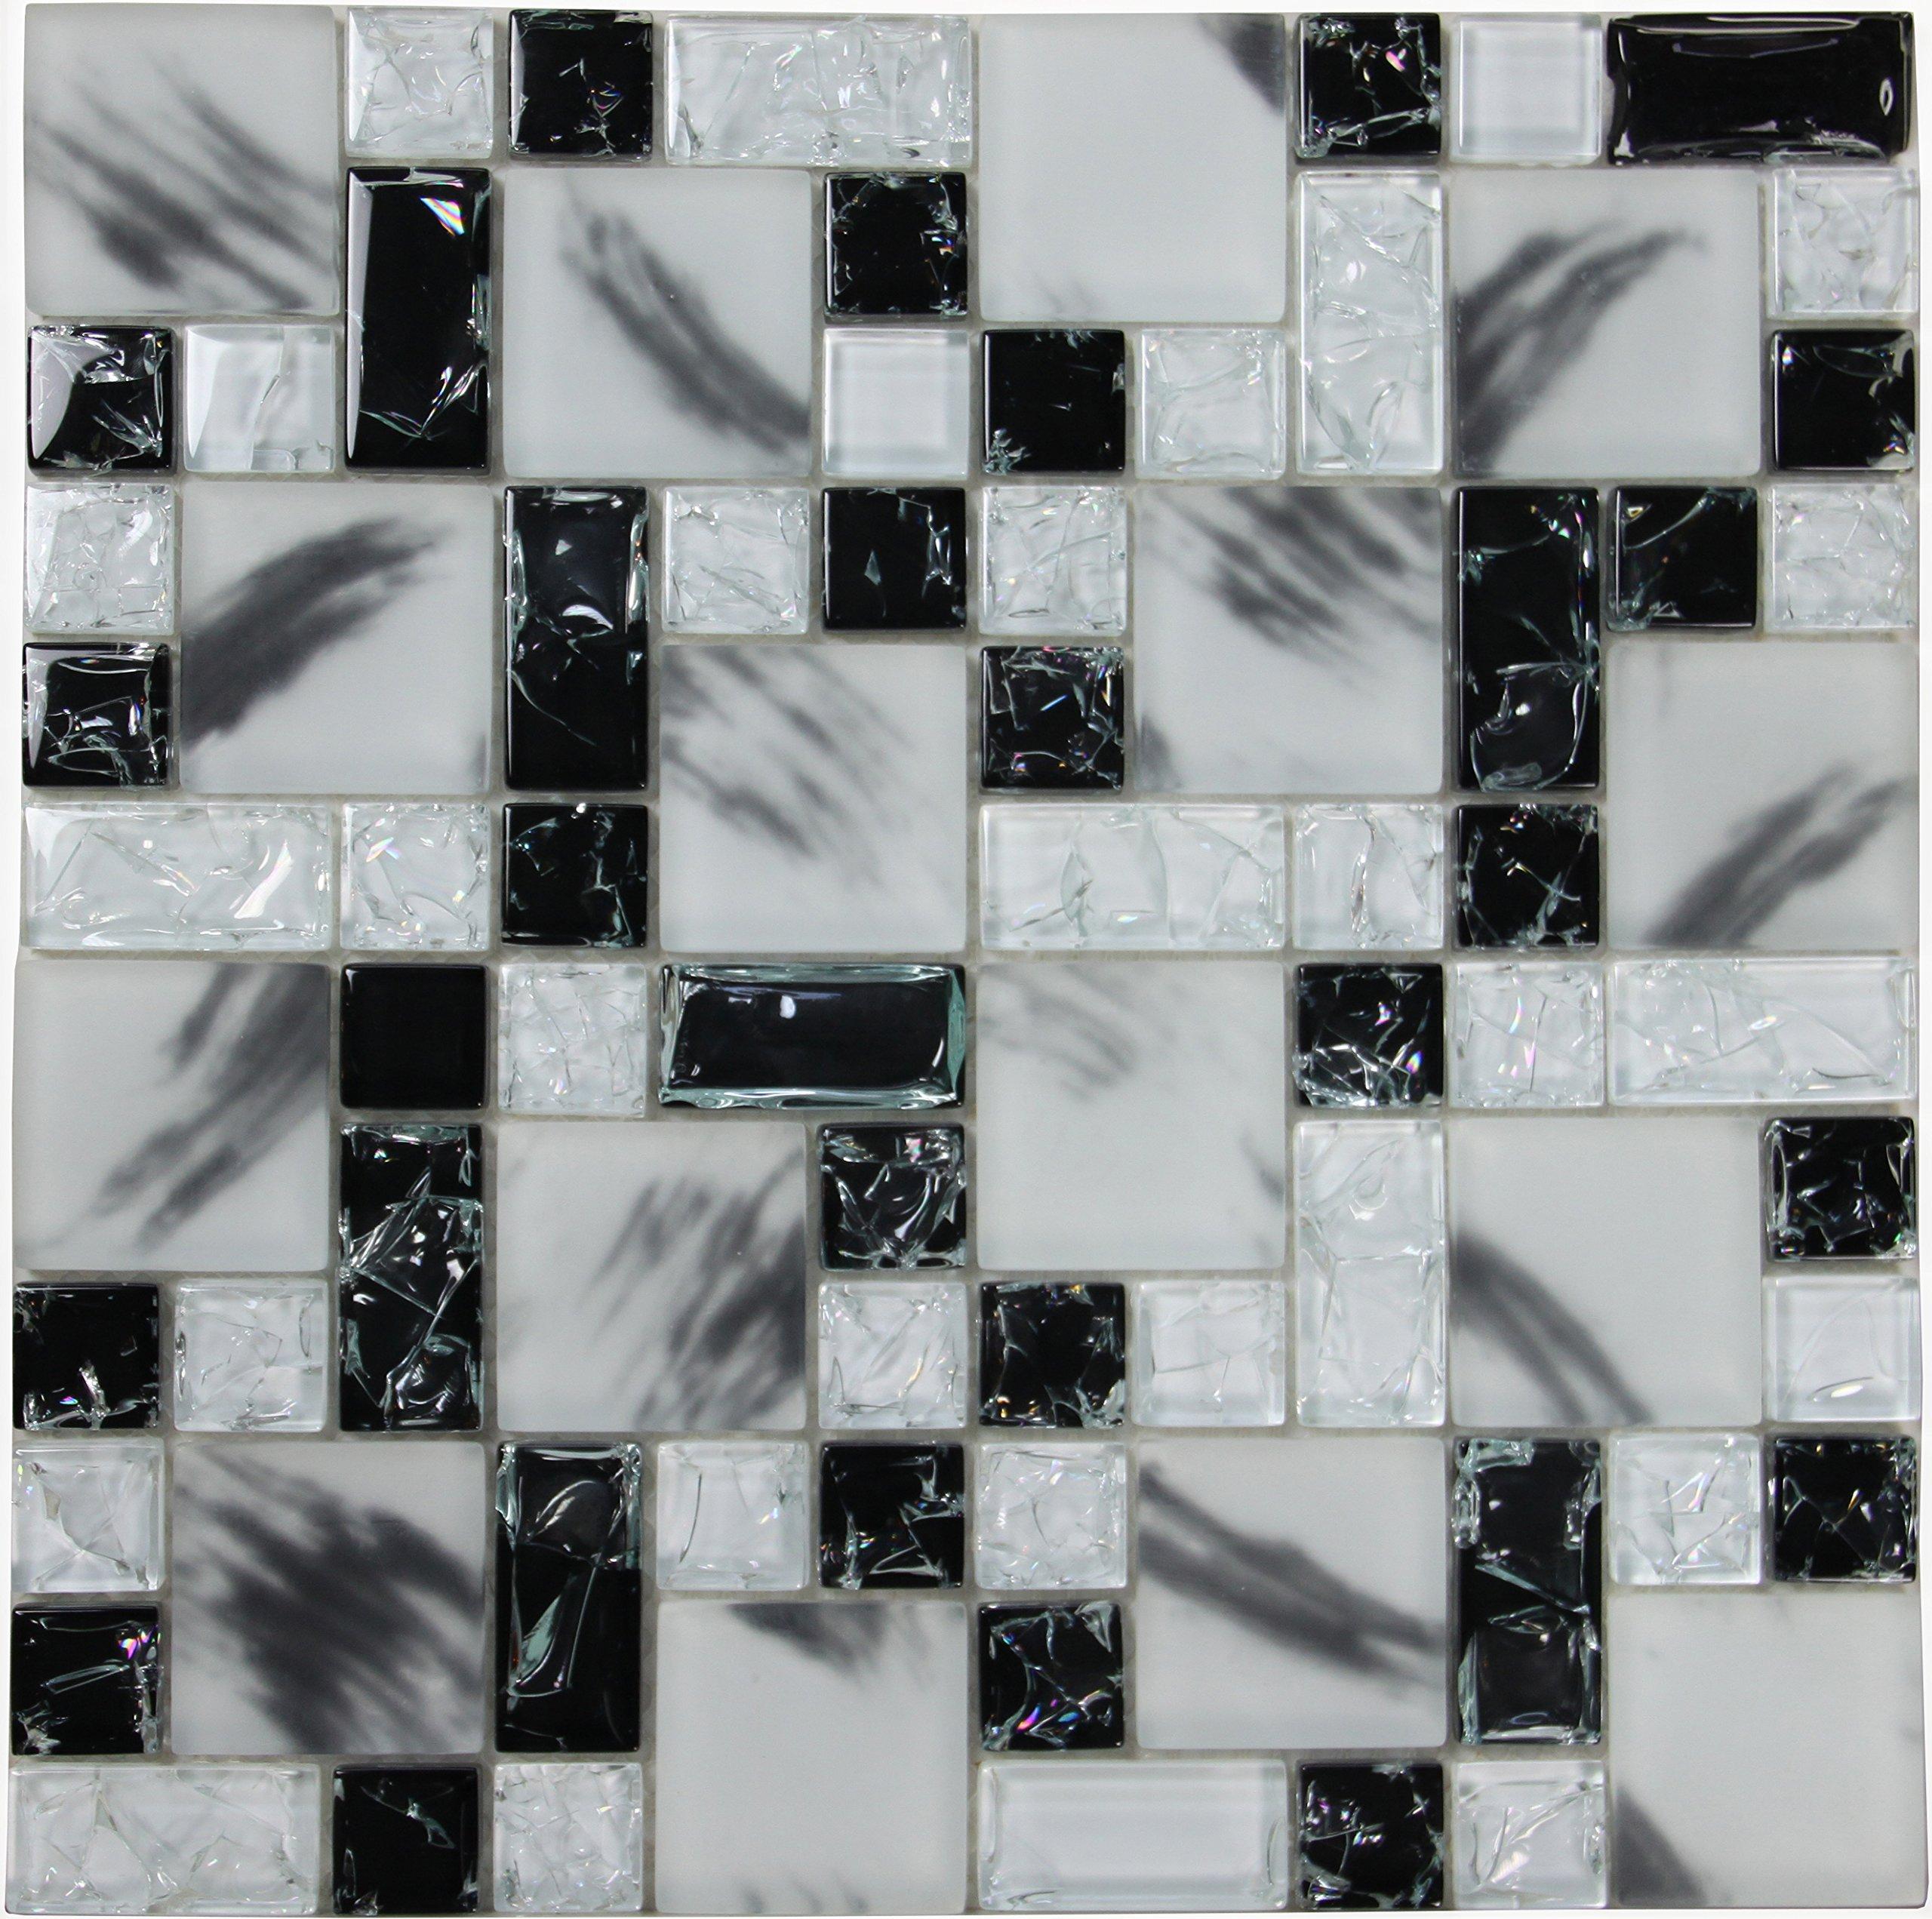 Crackle Albescent (GP07) Black White Glass Backsplash Mosaic Tile for Kitchen Bathroom Wall (1 Box / 11 Sheets)